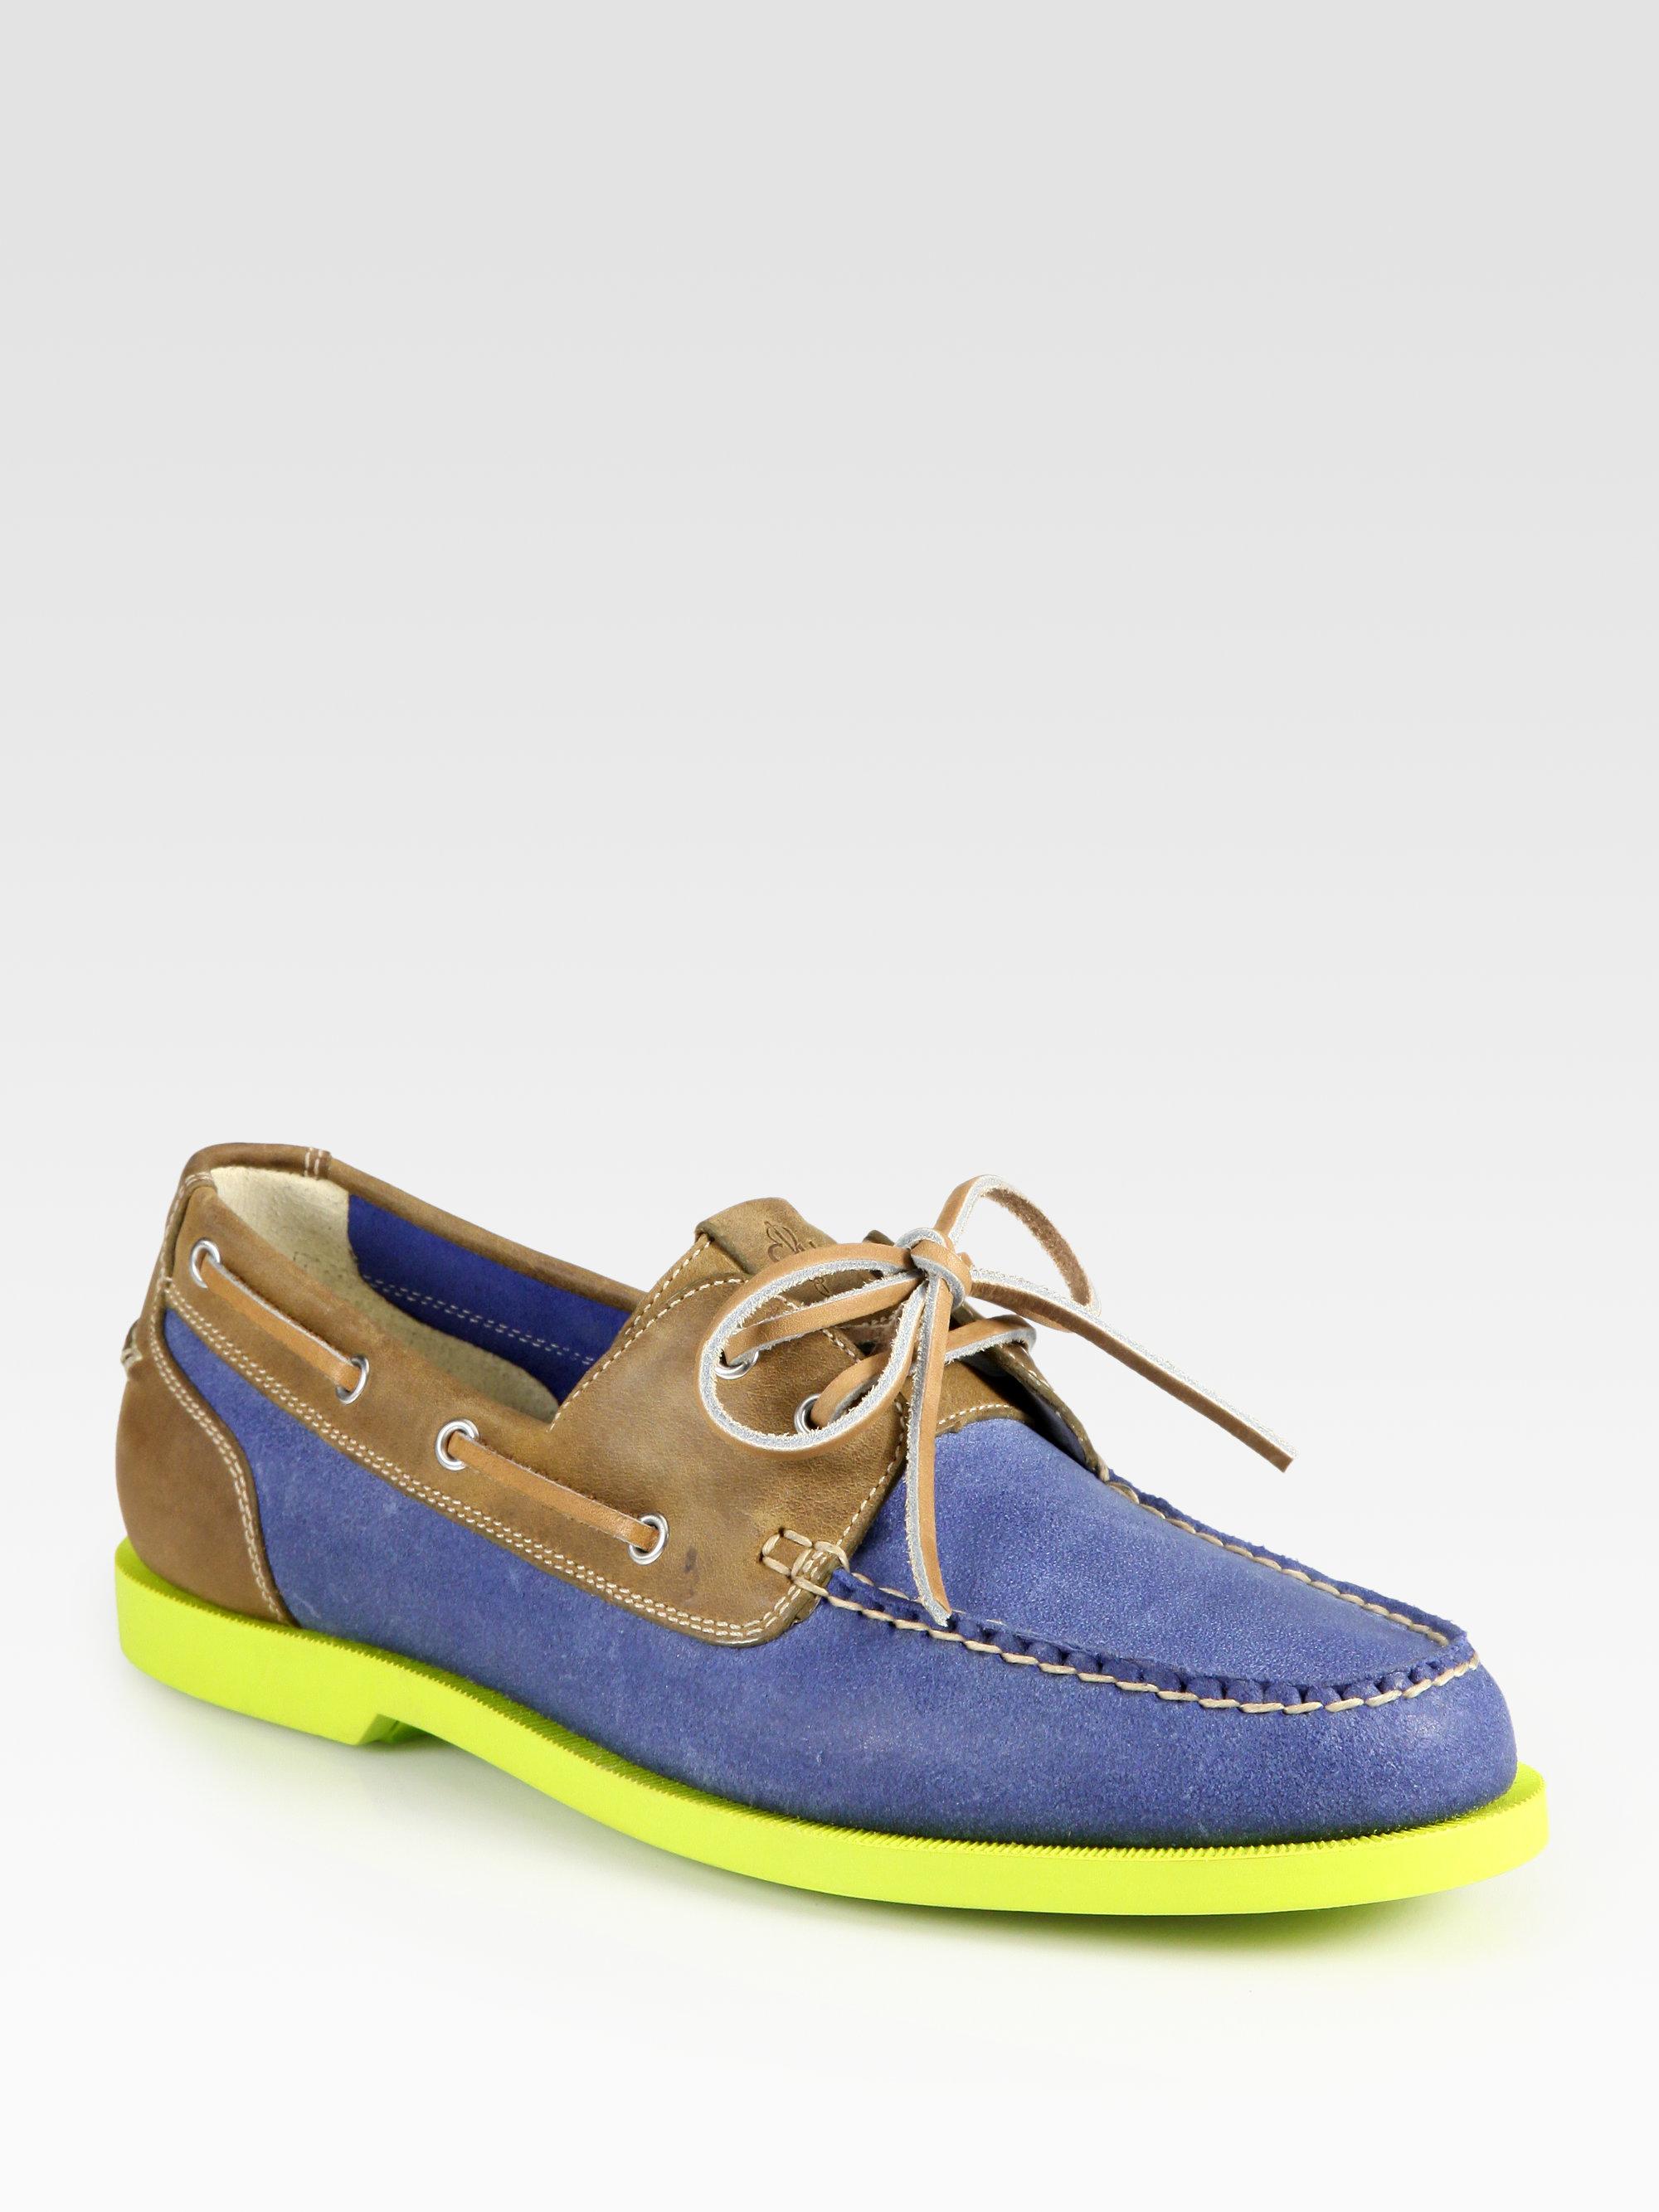 Yacht Deck Shoes